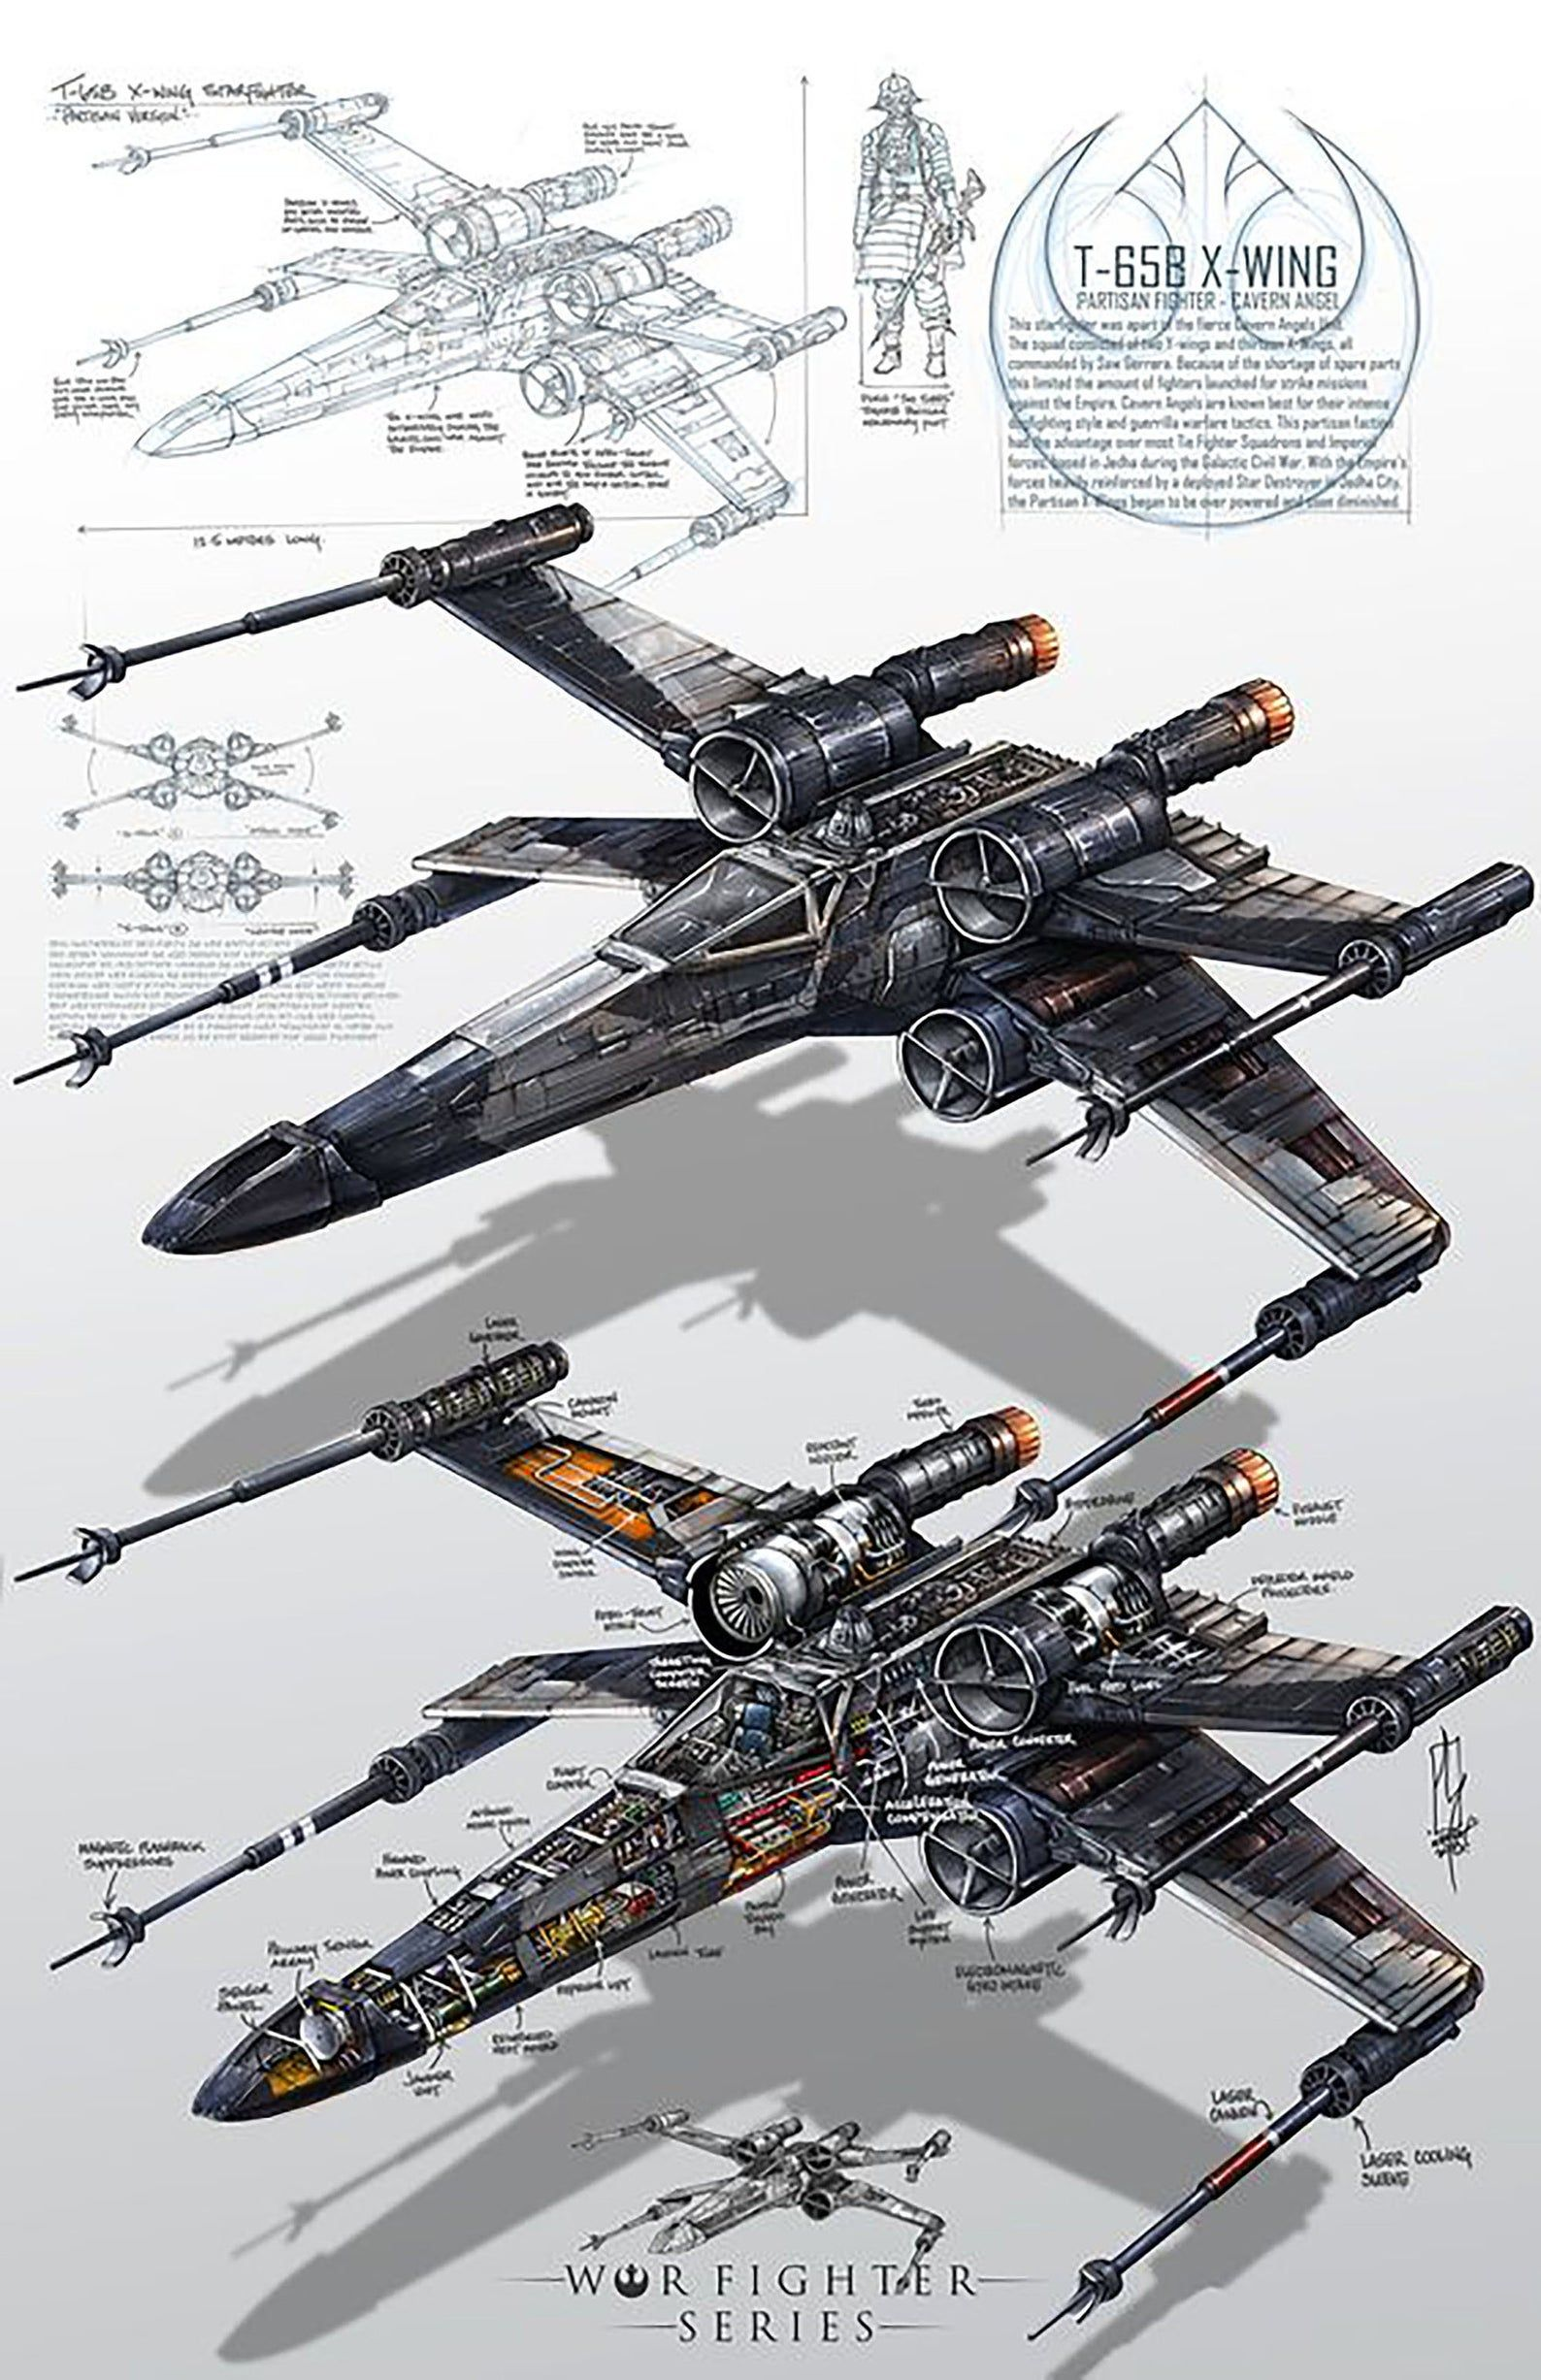 Star Wars X-Wing Fighter Vintage Movie Poster